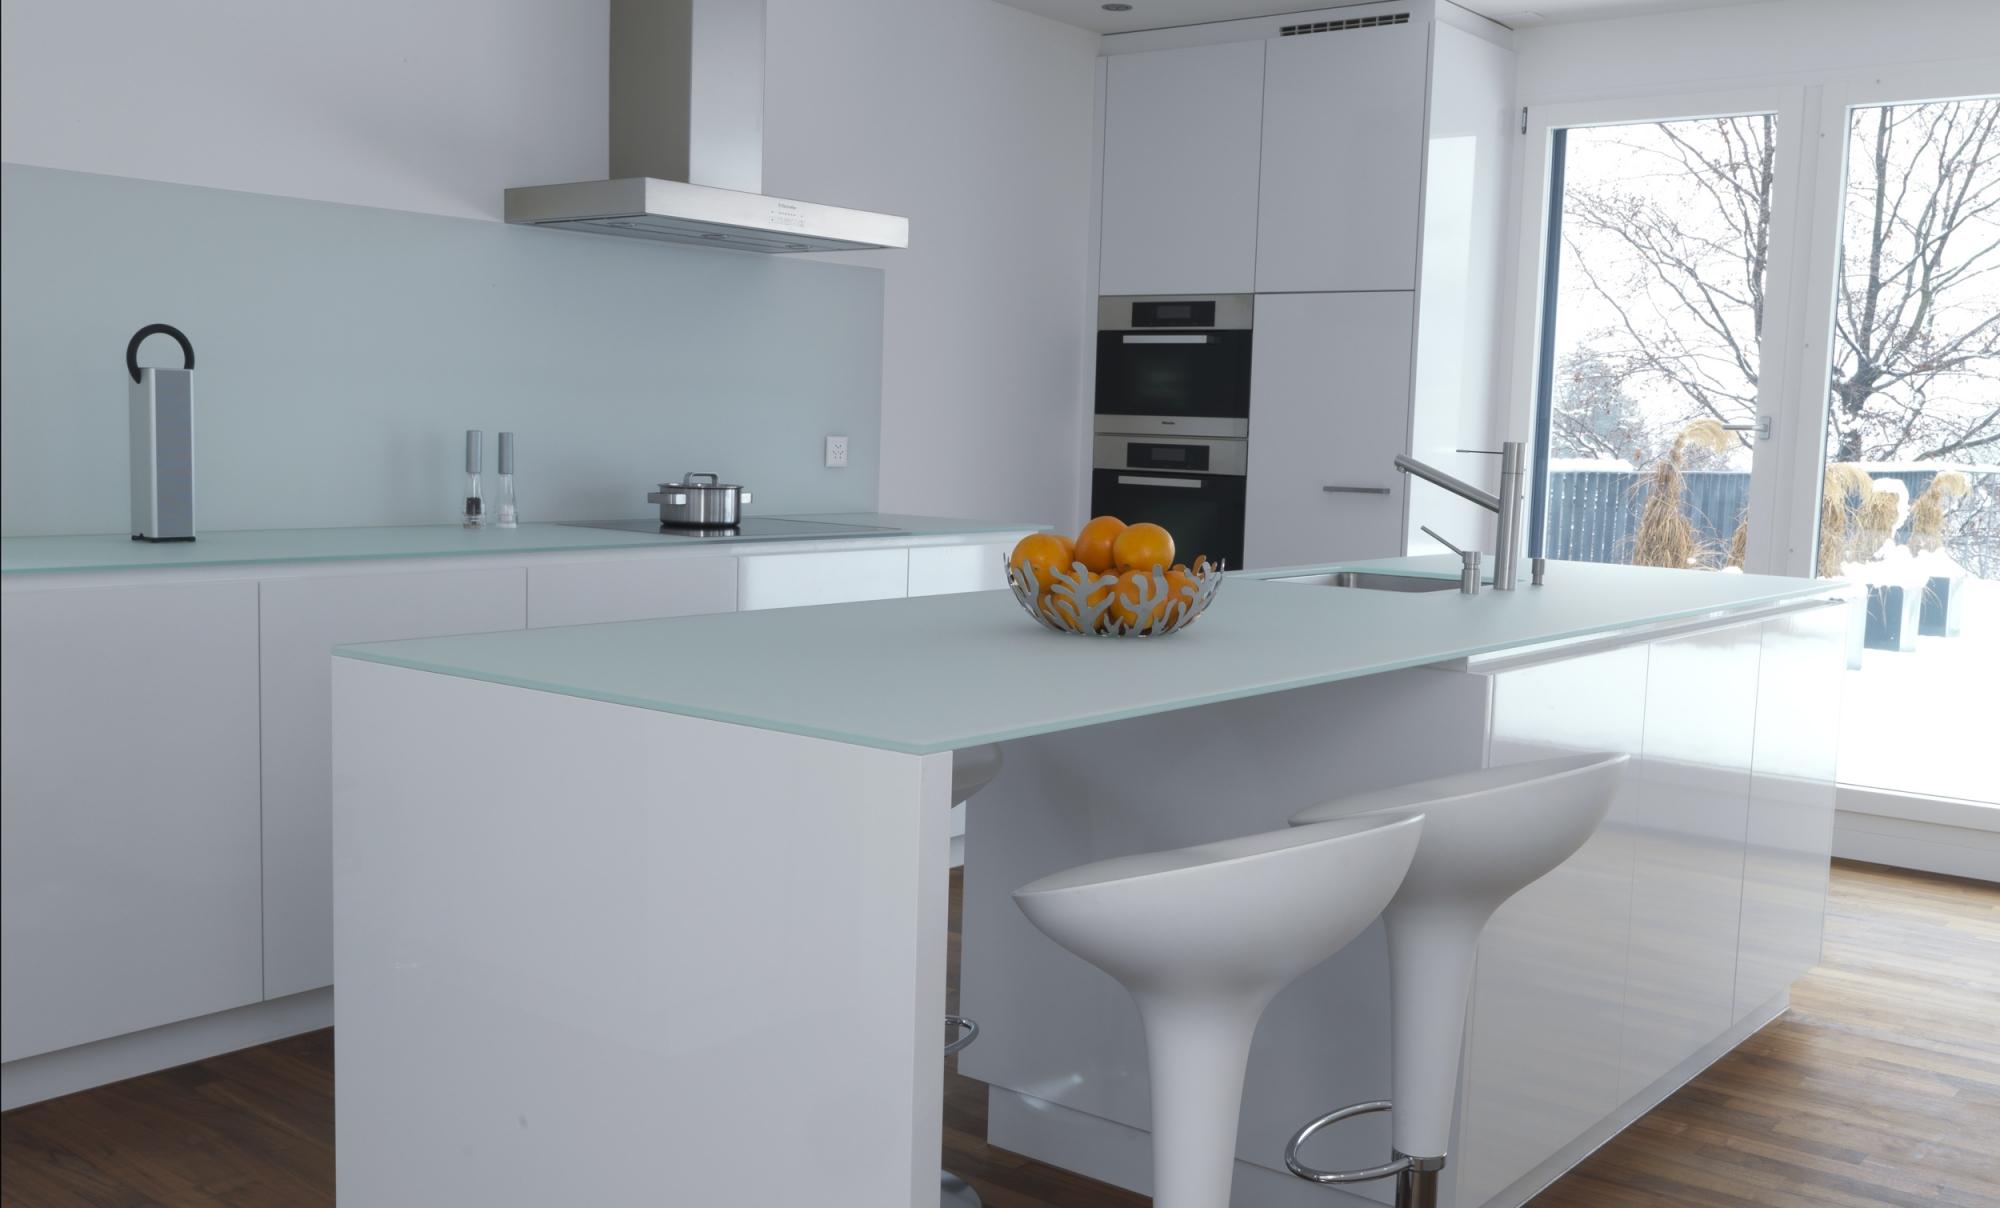 Paraschizzi cucina in vetro temperato paraschizzi cucina - Schienale cucina in vetro temperato ...